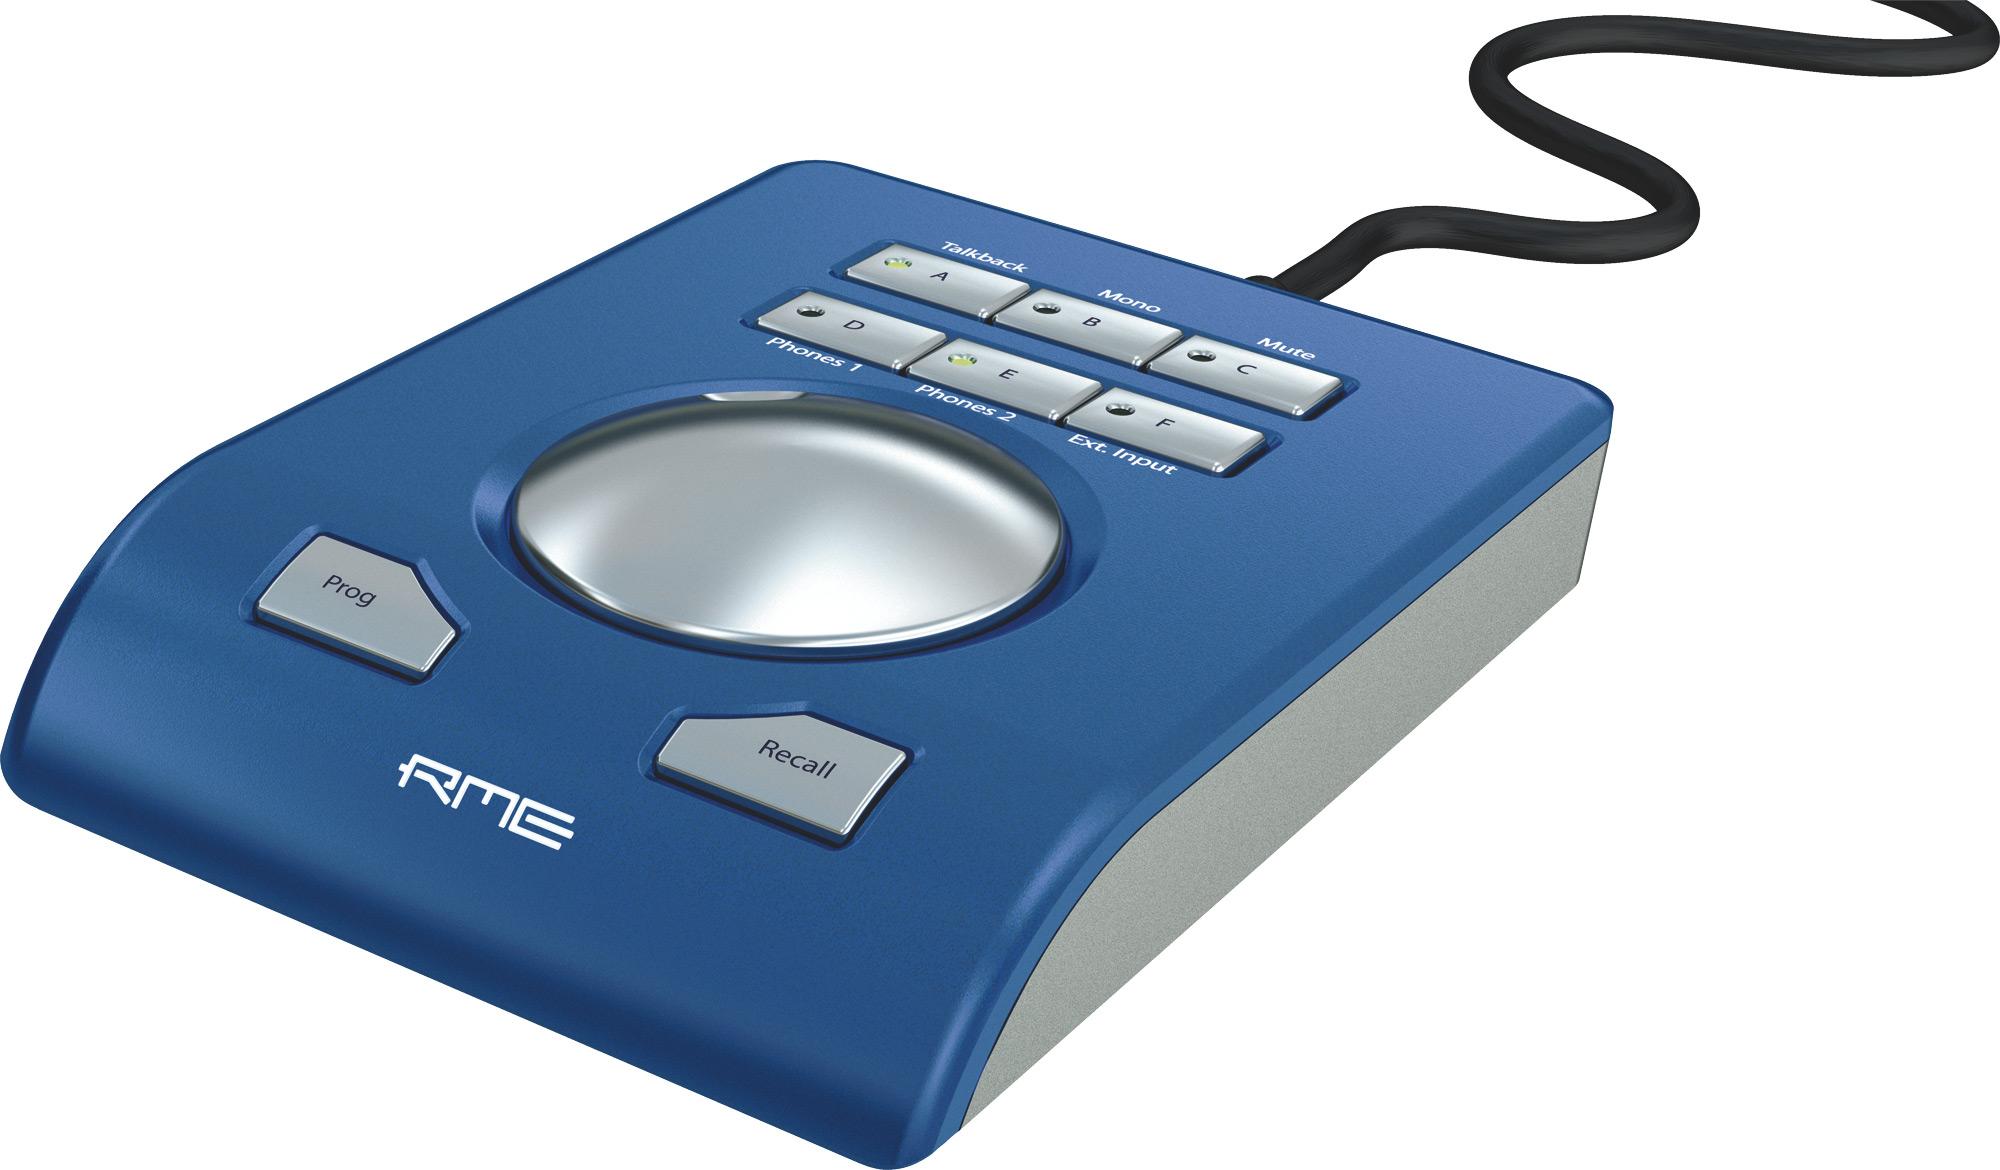 arc 423a2 remote control manual